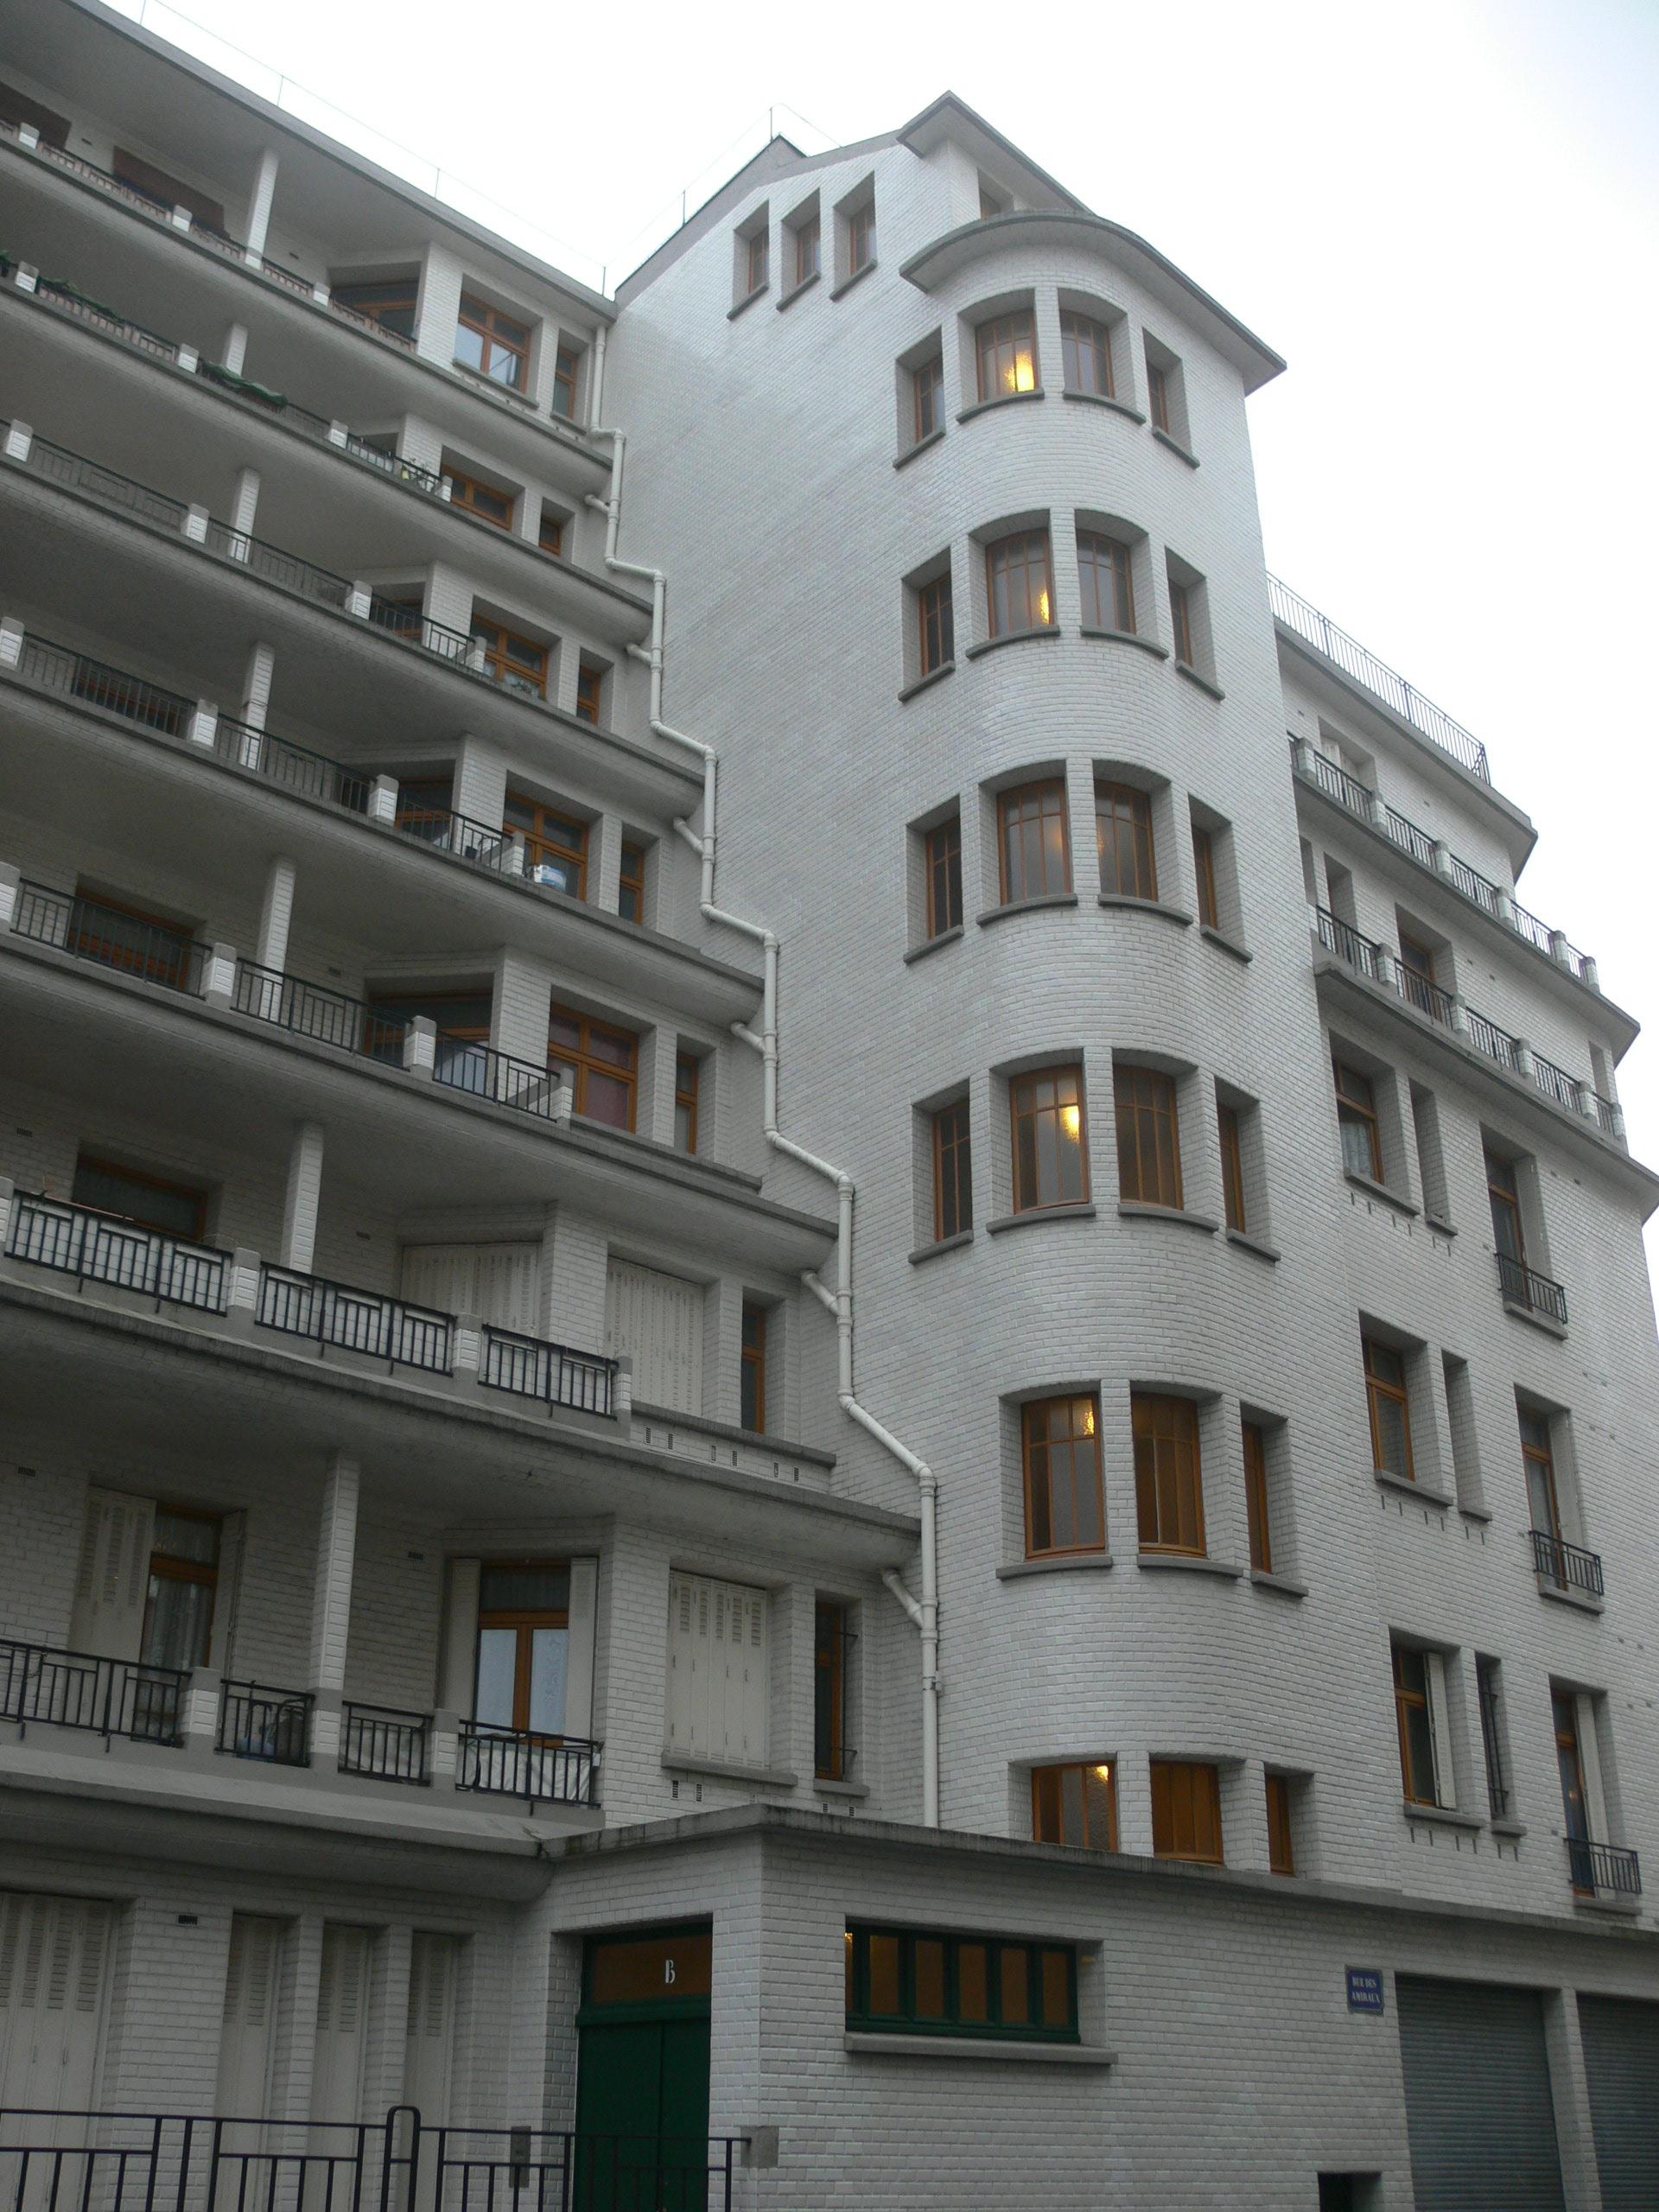 File:immeuble Sauvage - Piscine Des Amiraux - Rue Des ... dedans Piscine Des Amiraux